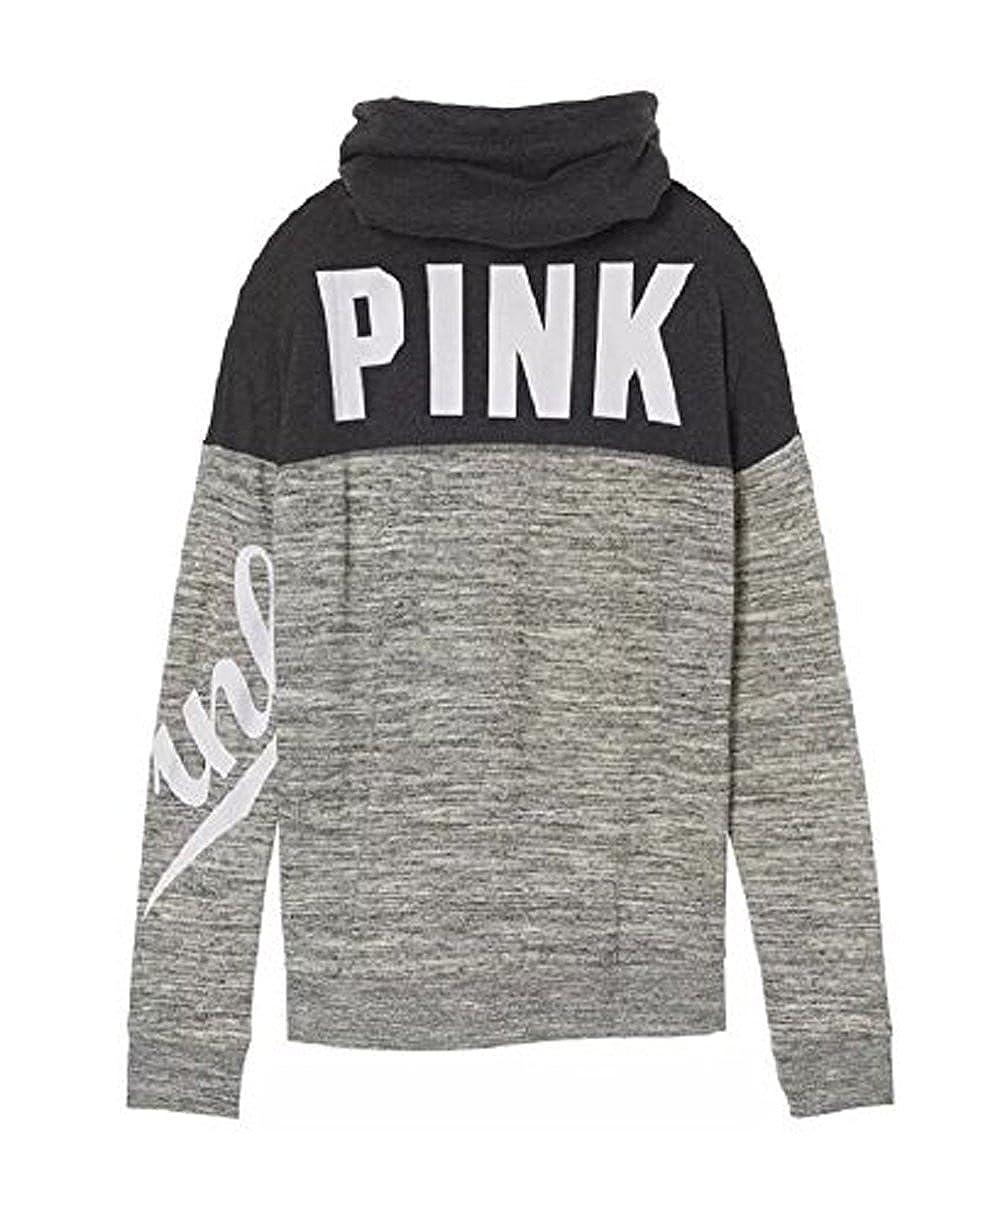 Victorias Secret Pink High Cowl Neck Colorblock Pullover Sweatshirt Gray Marl Medium